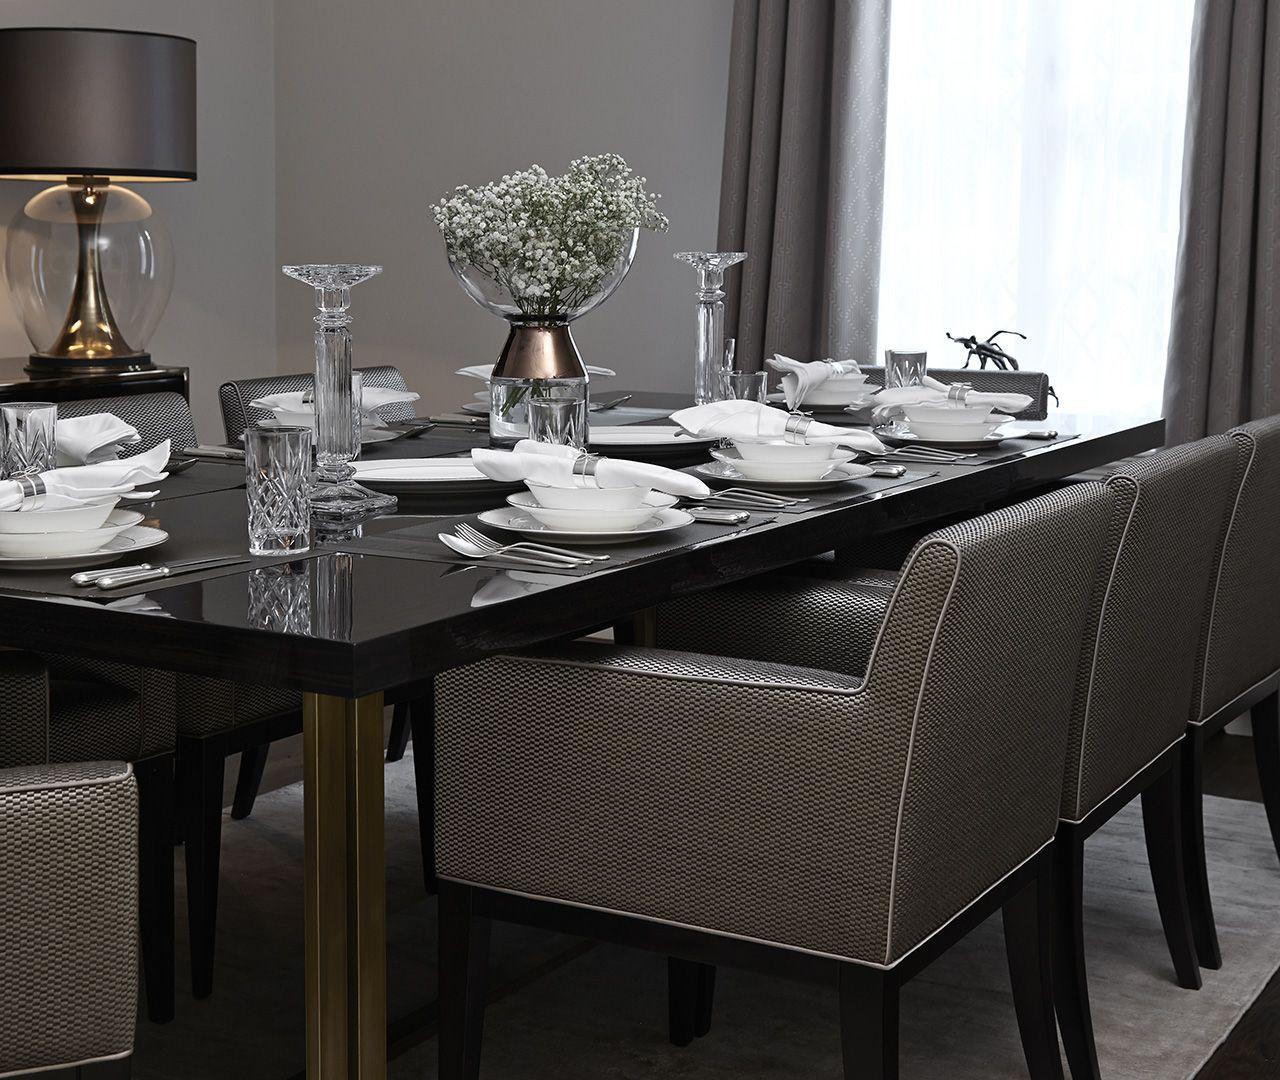 Boscolo 11 Luxury Dining Room Dining Room Design Luxury Interior Design